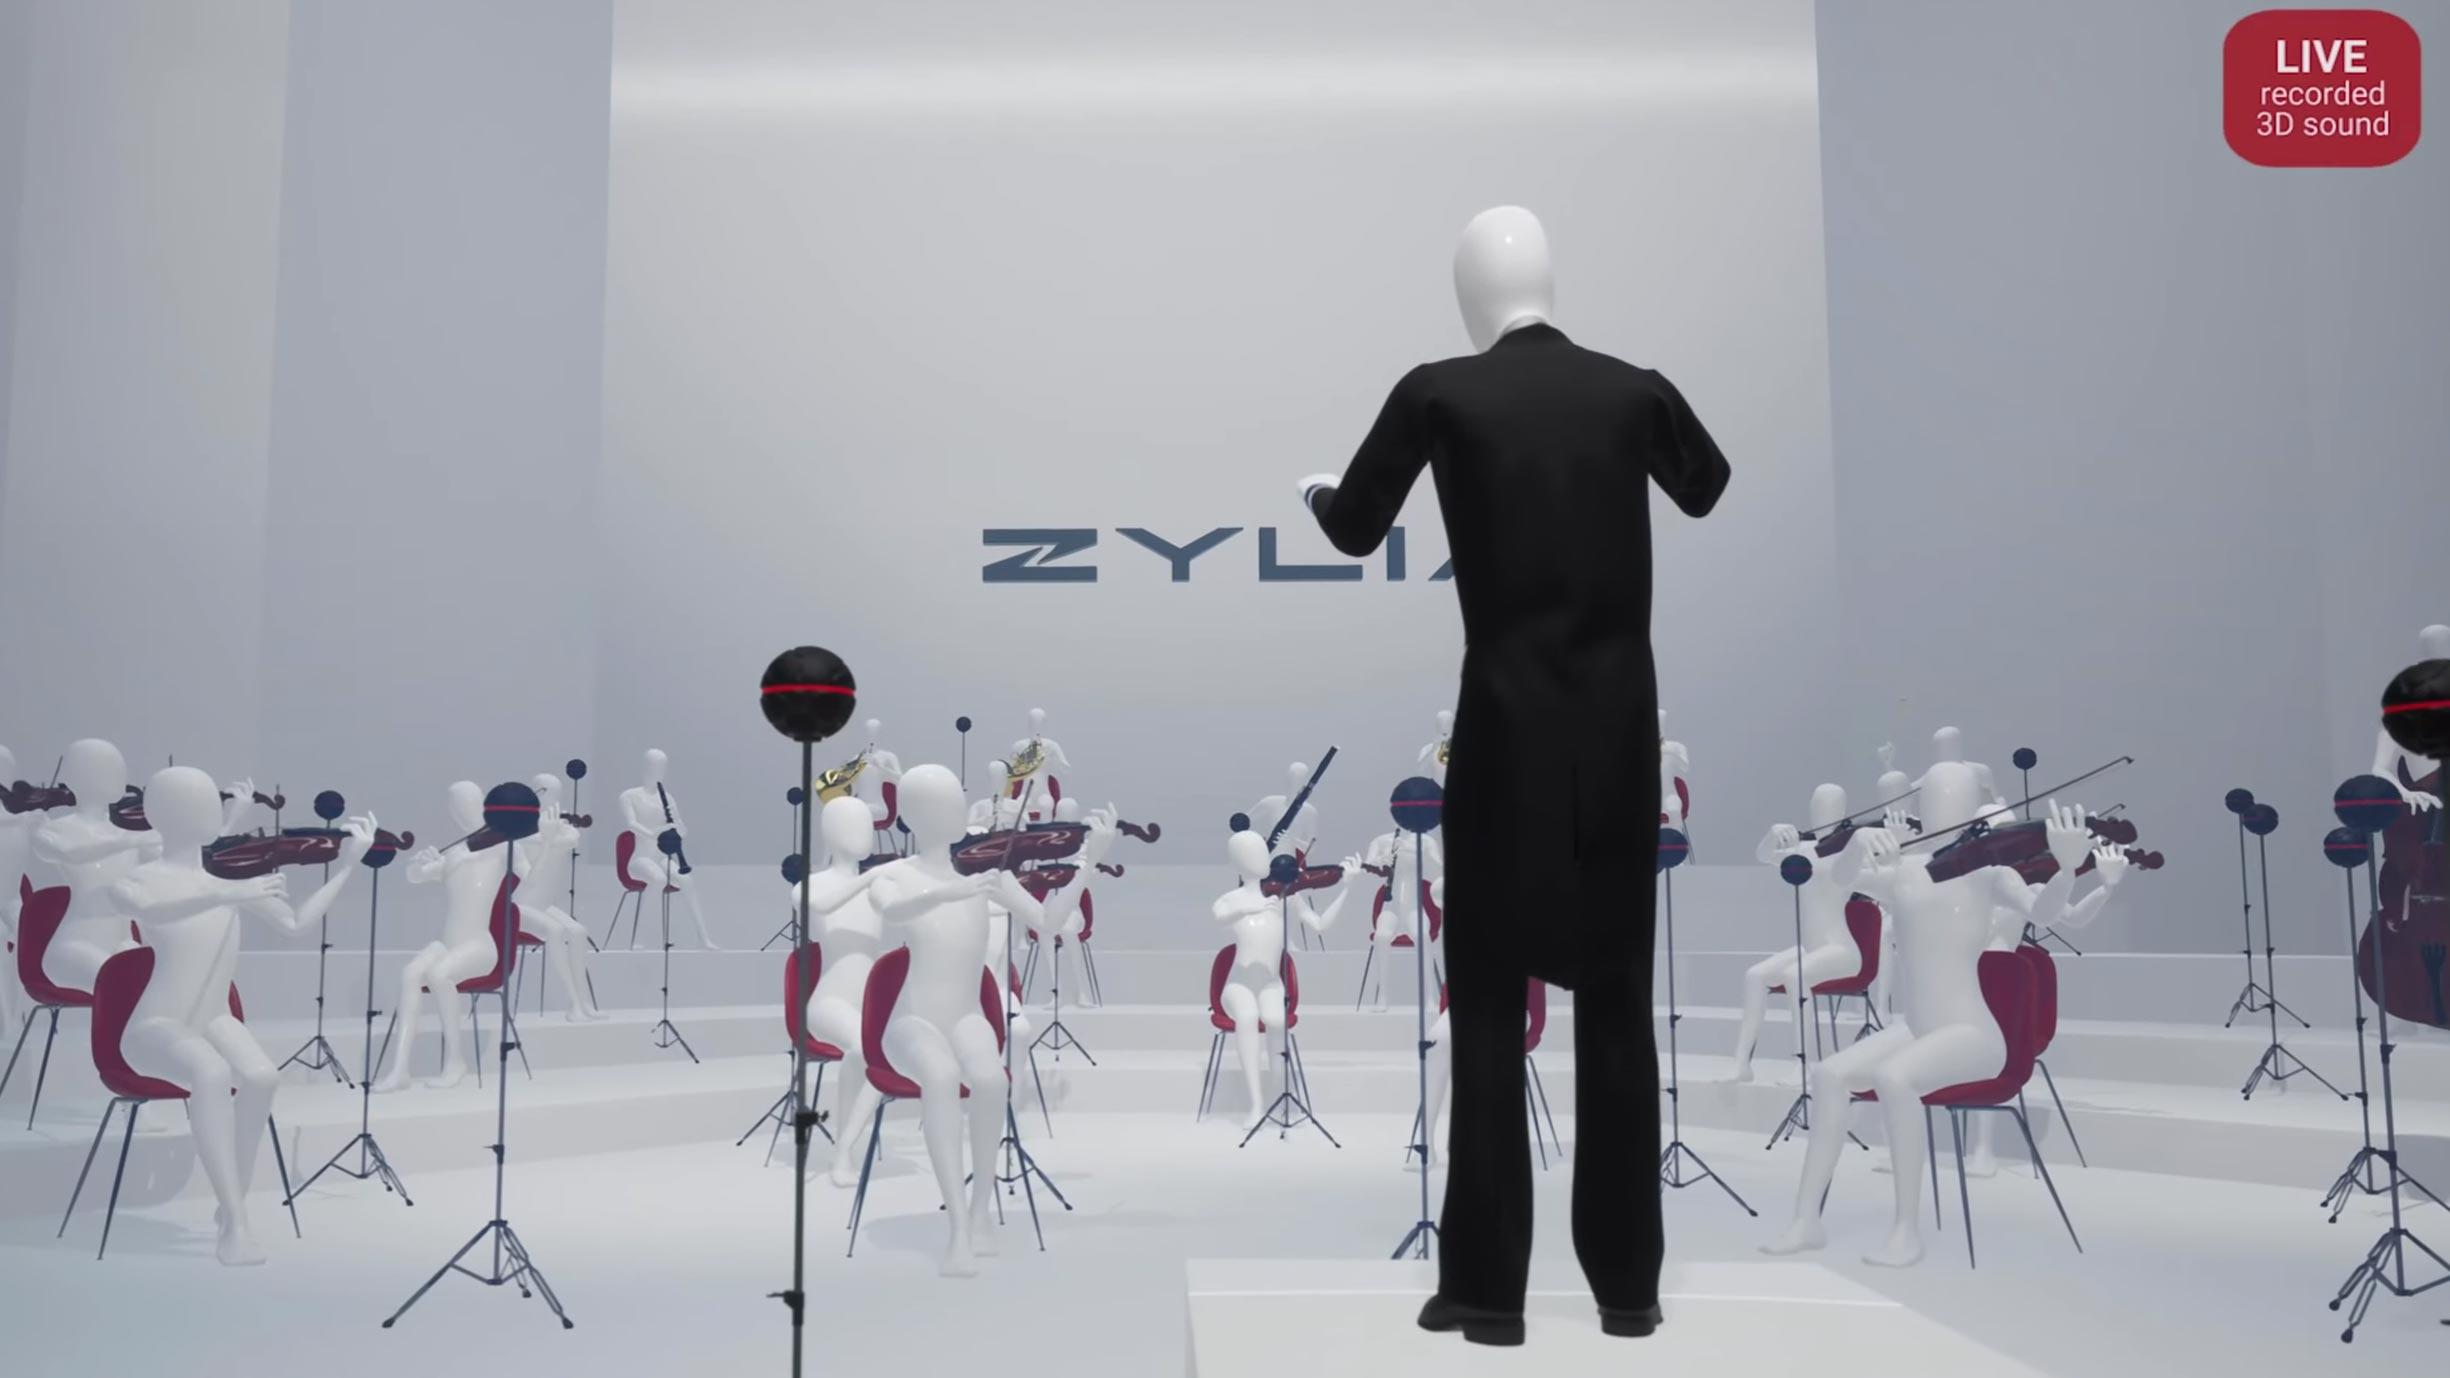 Zylia navigable audio system: a 3D sound experience